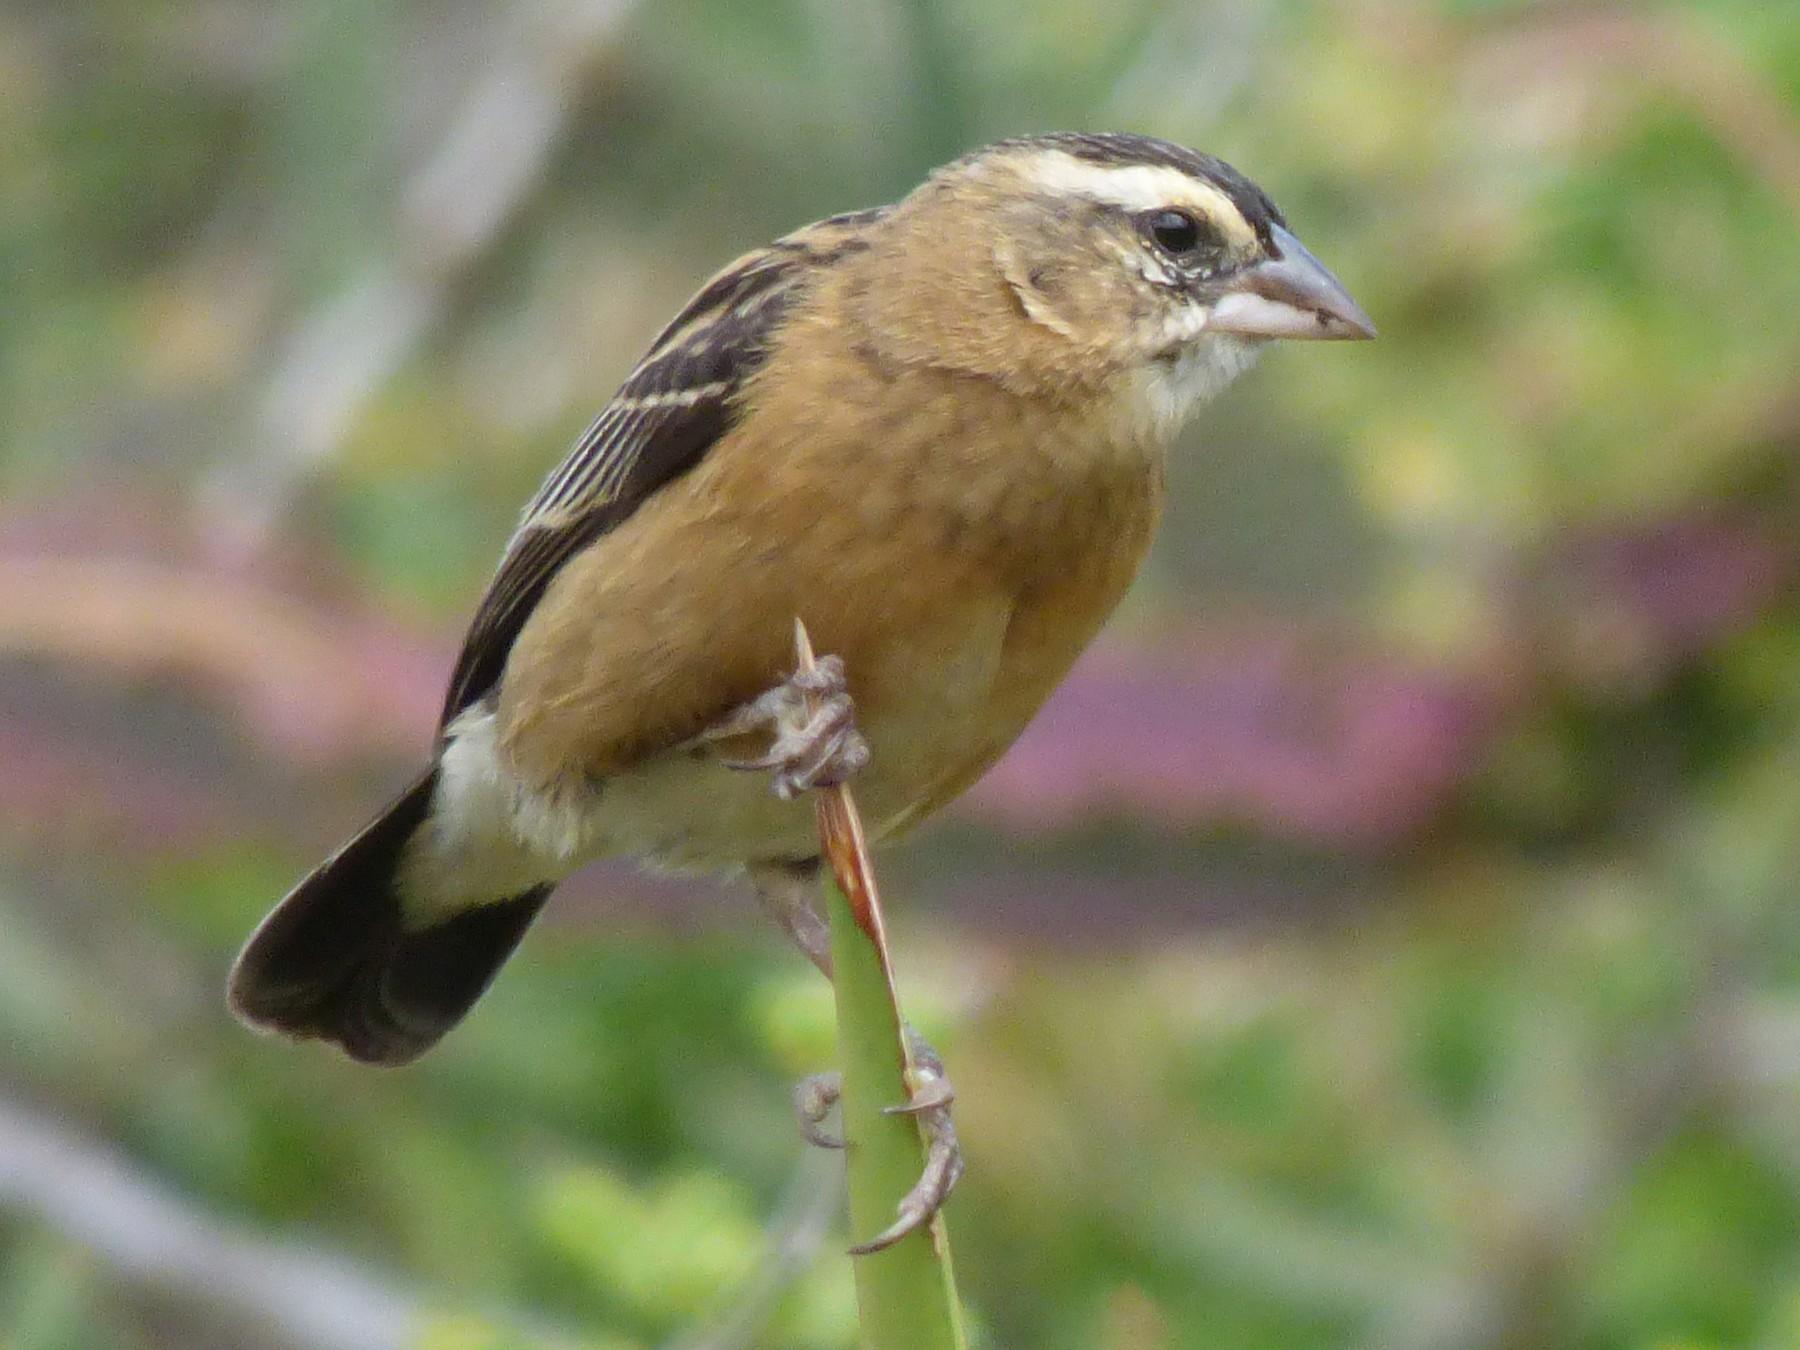 Red-collared Widowbird - Laurie Koepke